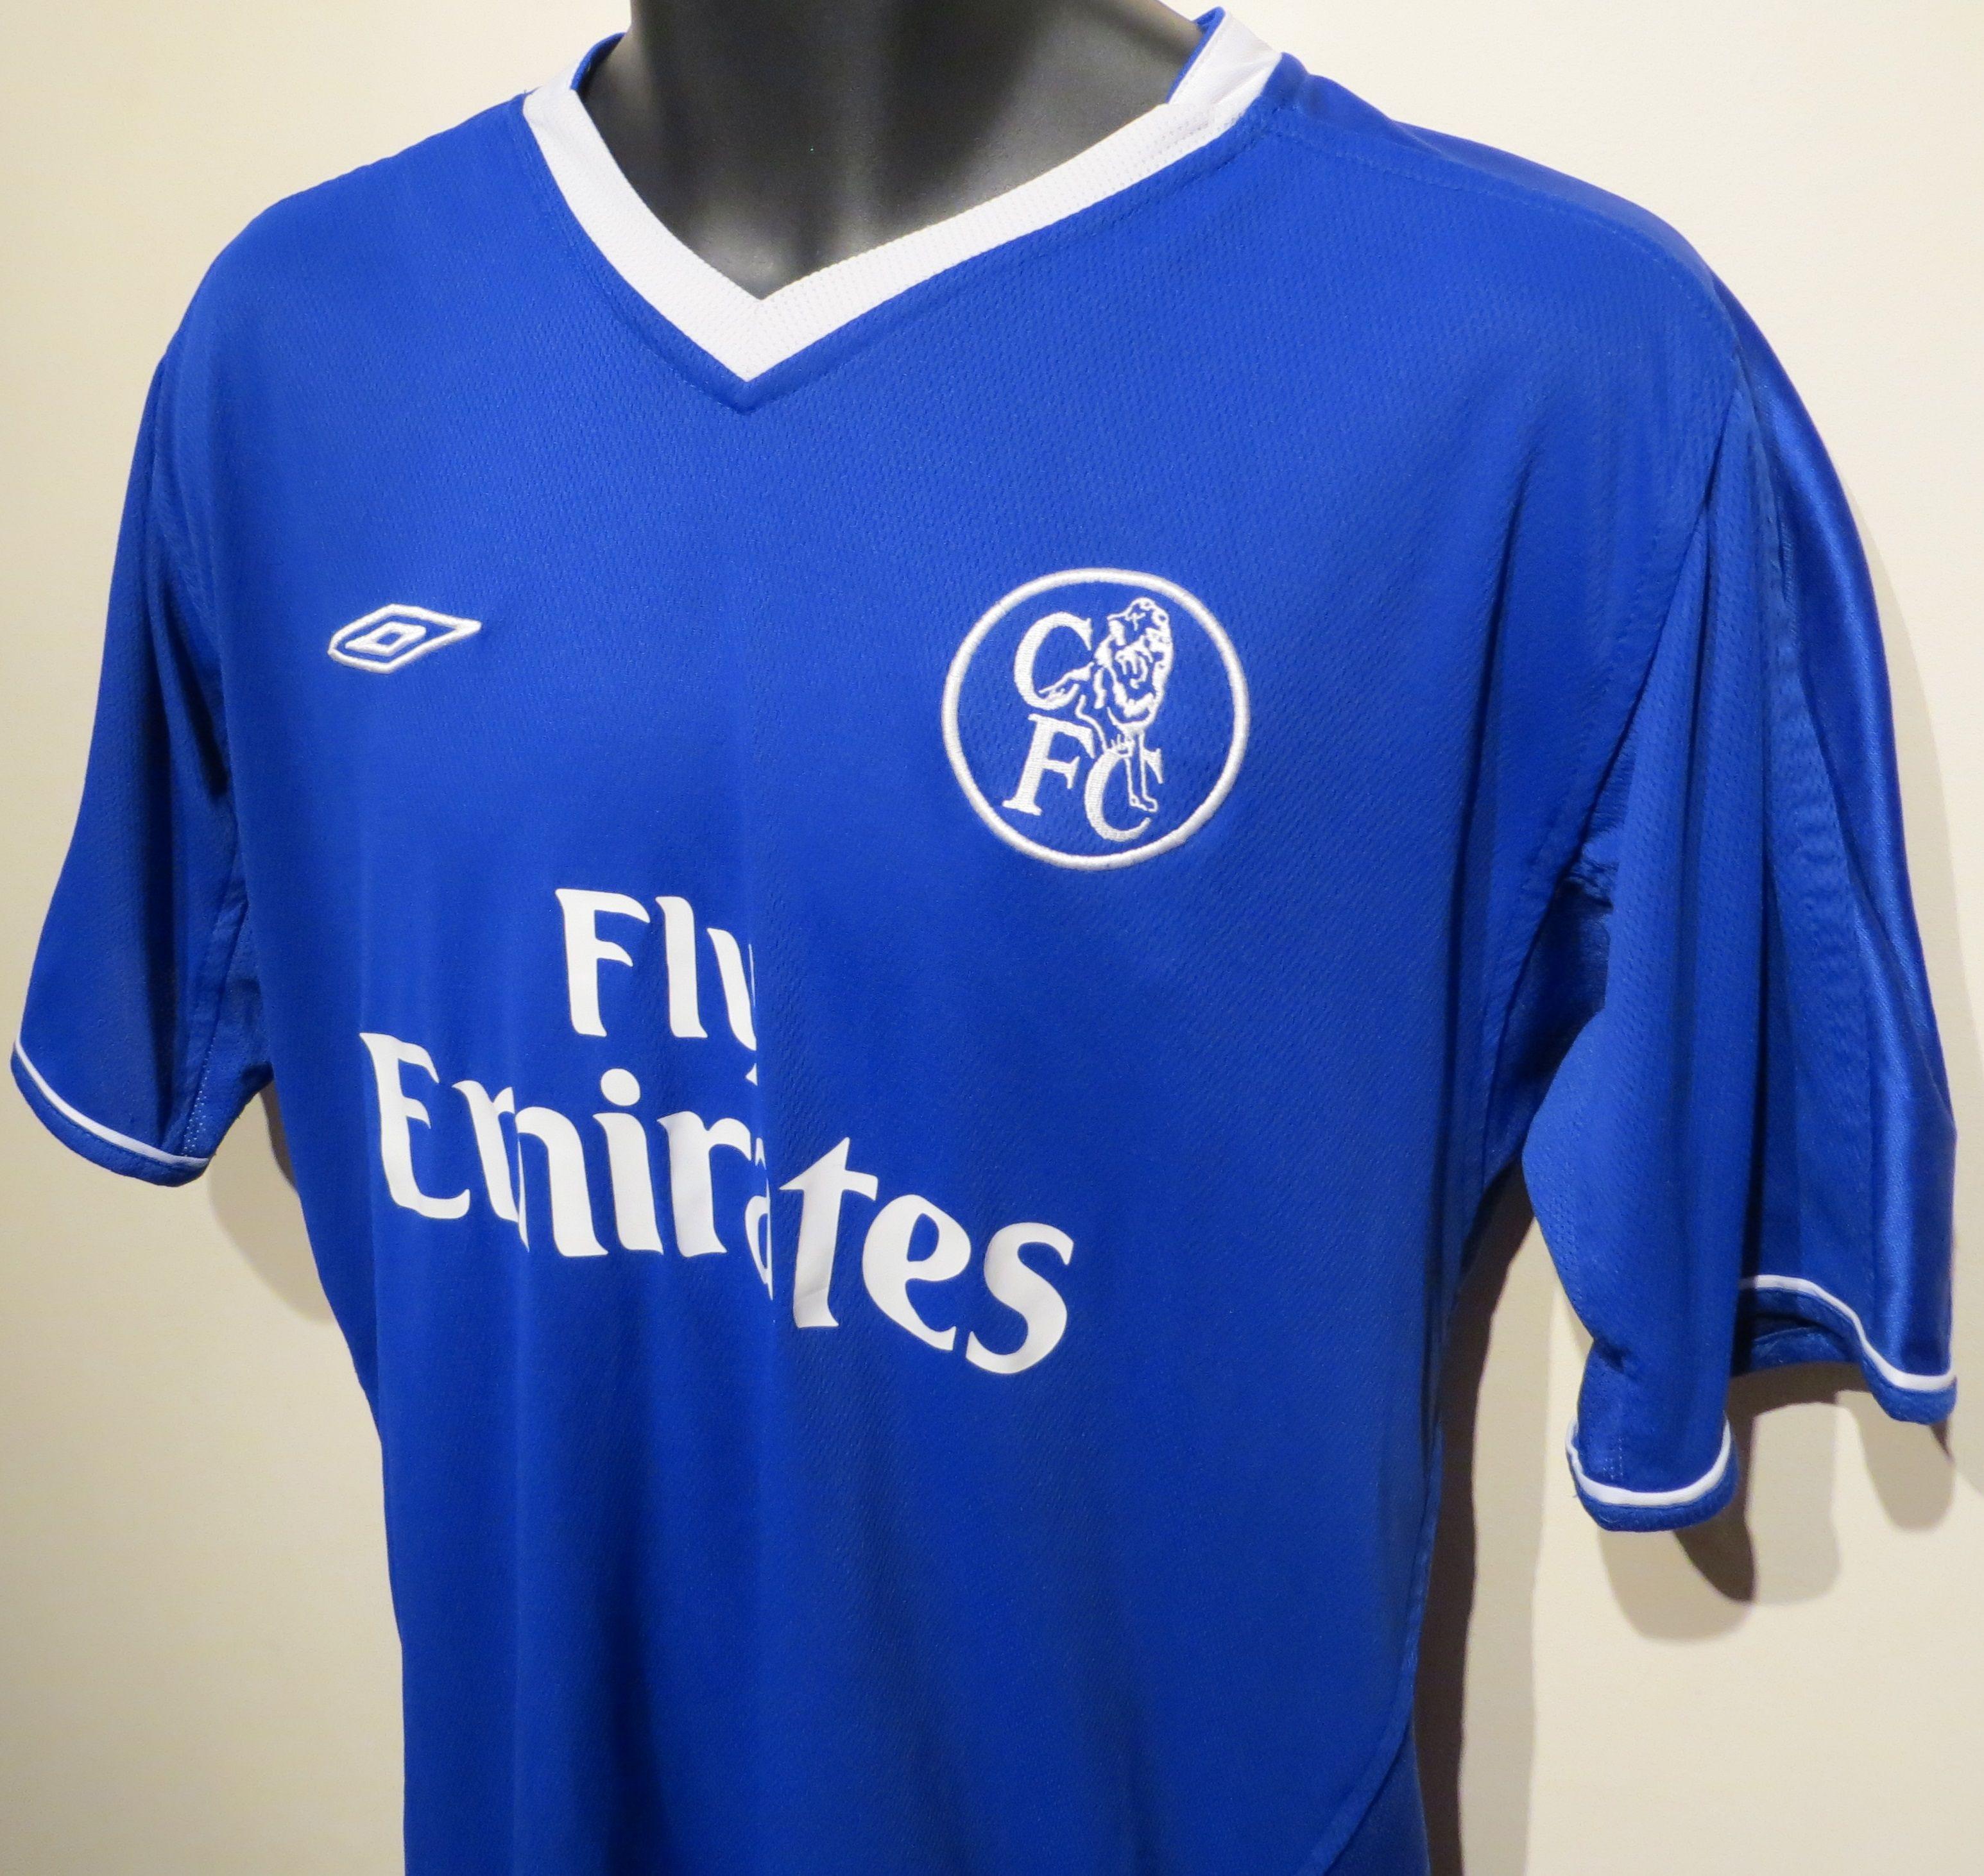 hot sale online 18699 98fb9 Chelsea shirt by Umbro. | Retro Football Shirts | Retro ...